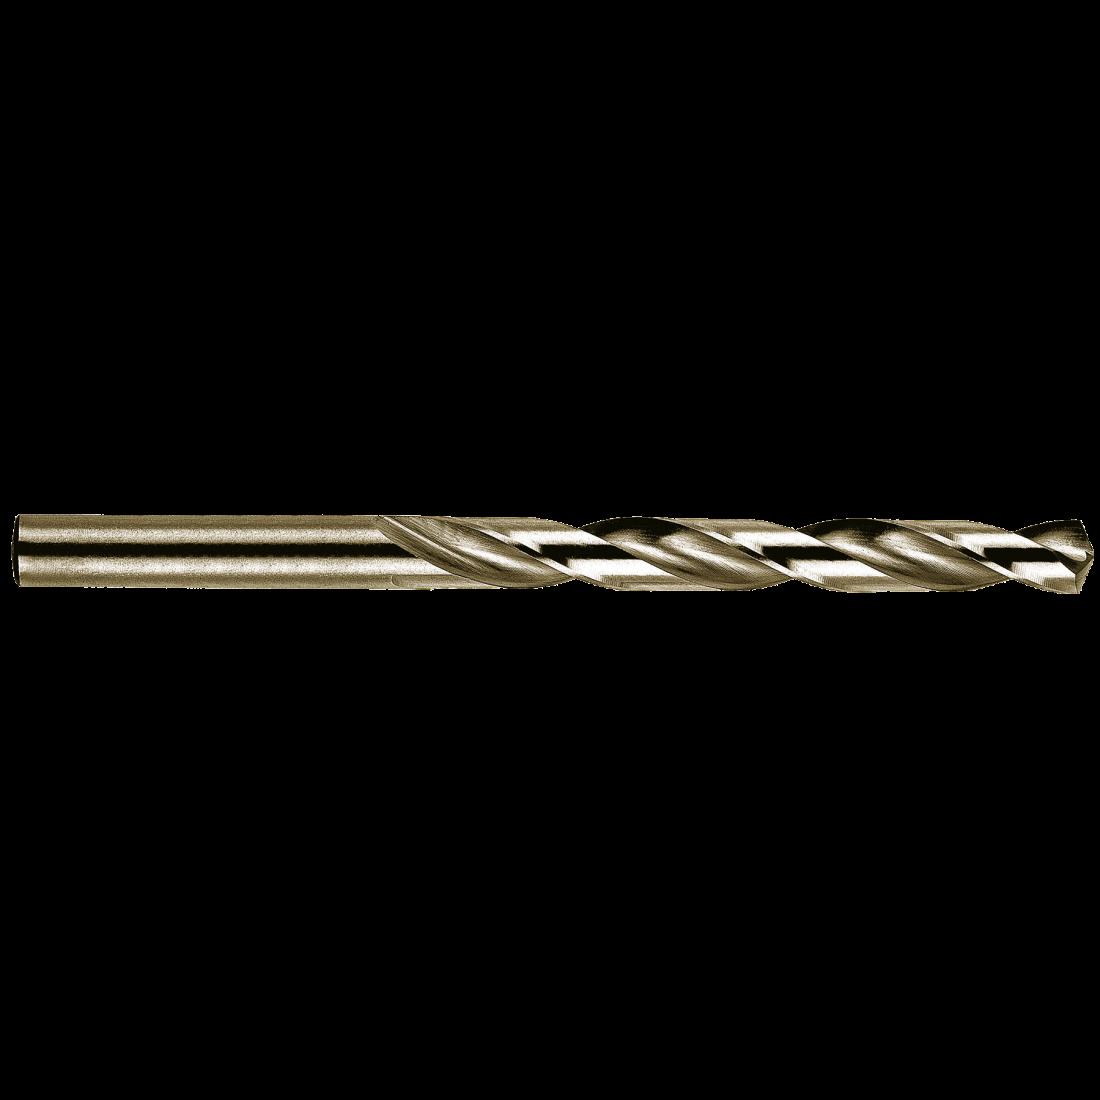 Сверло по металлу Heller НSS-Co DIN 338 RN  4,2x43x75мм (10шт)